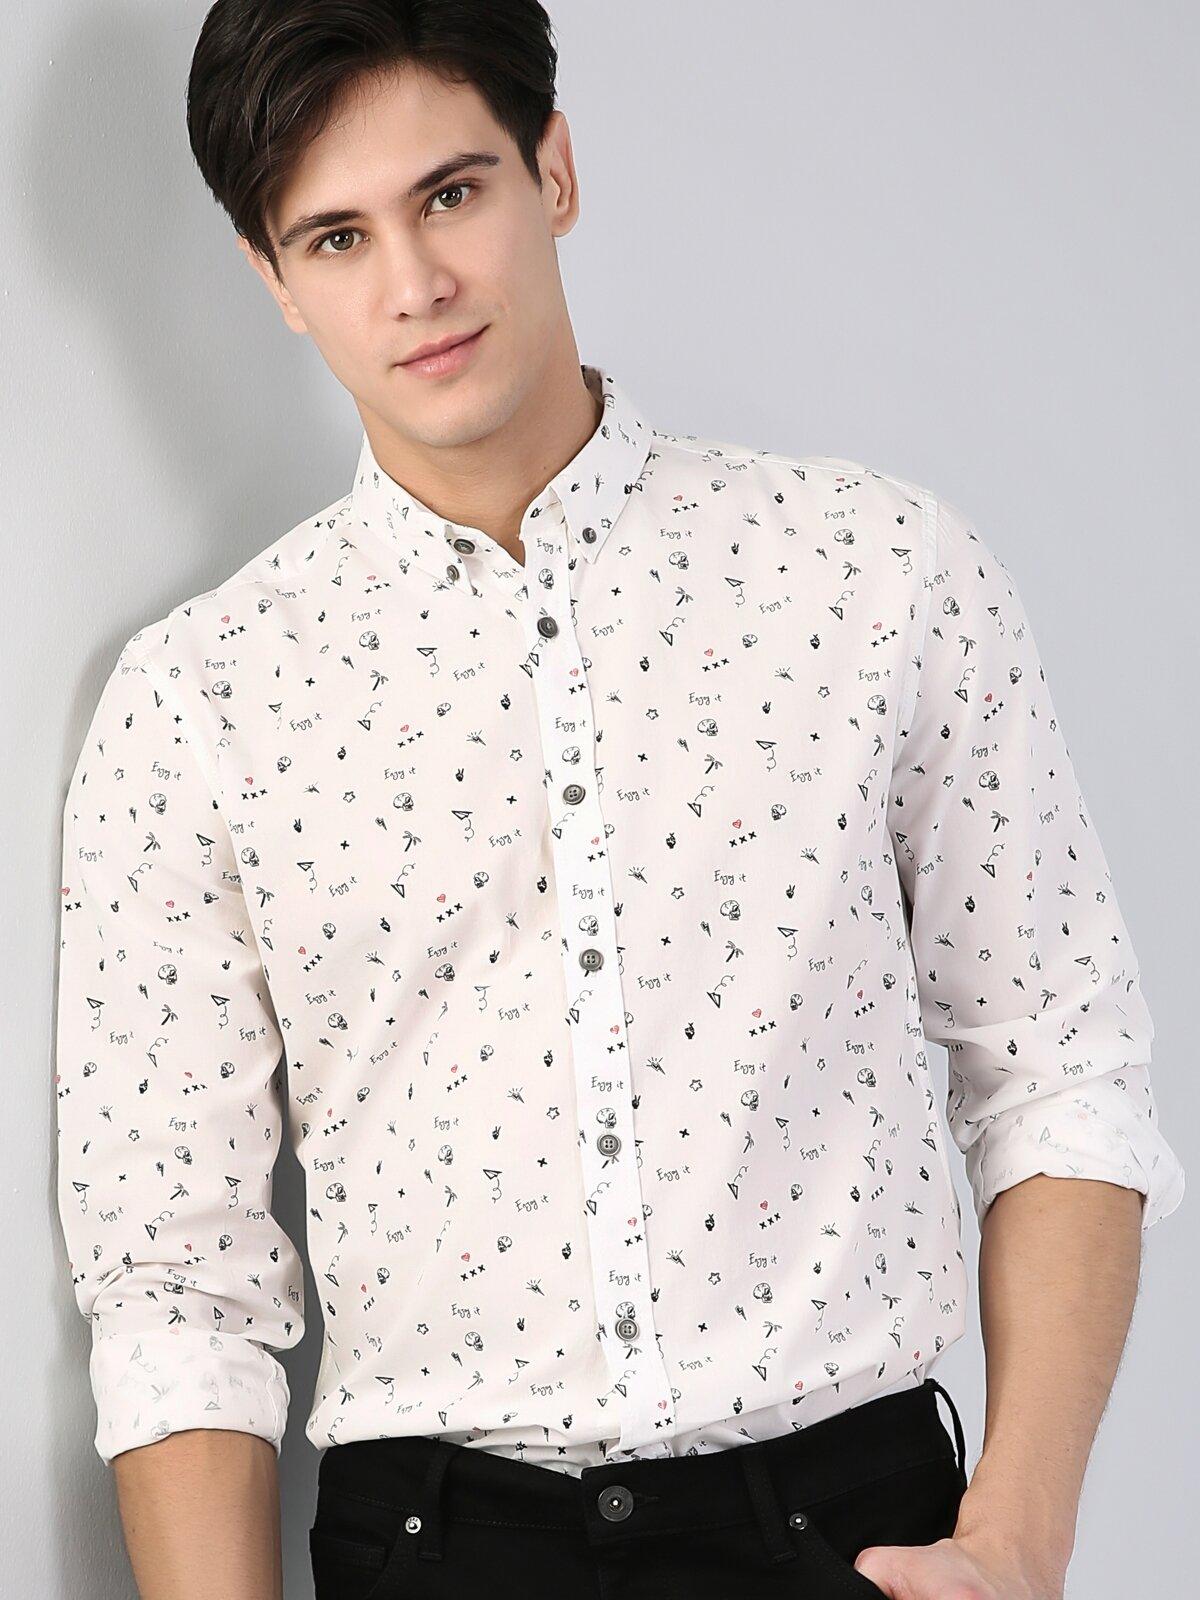 Slim Fit Standart Kol V Yaka Beyaz Erkek Gömlek Uzun Kol